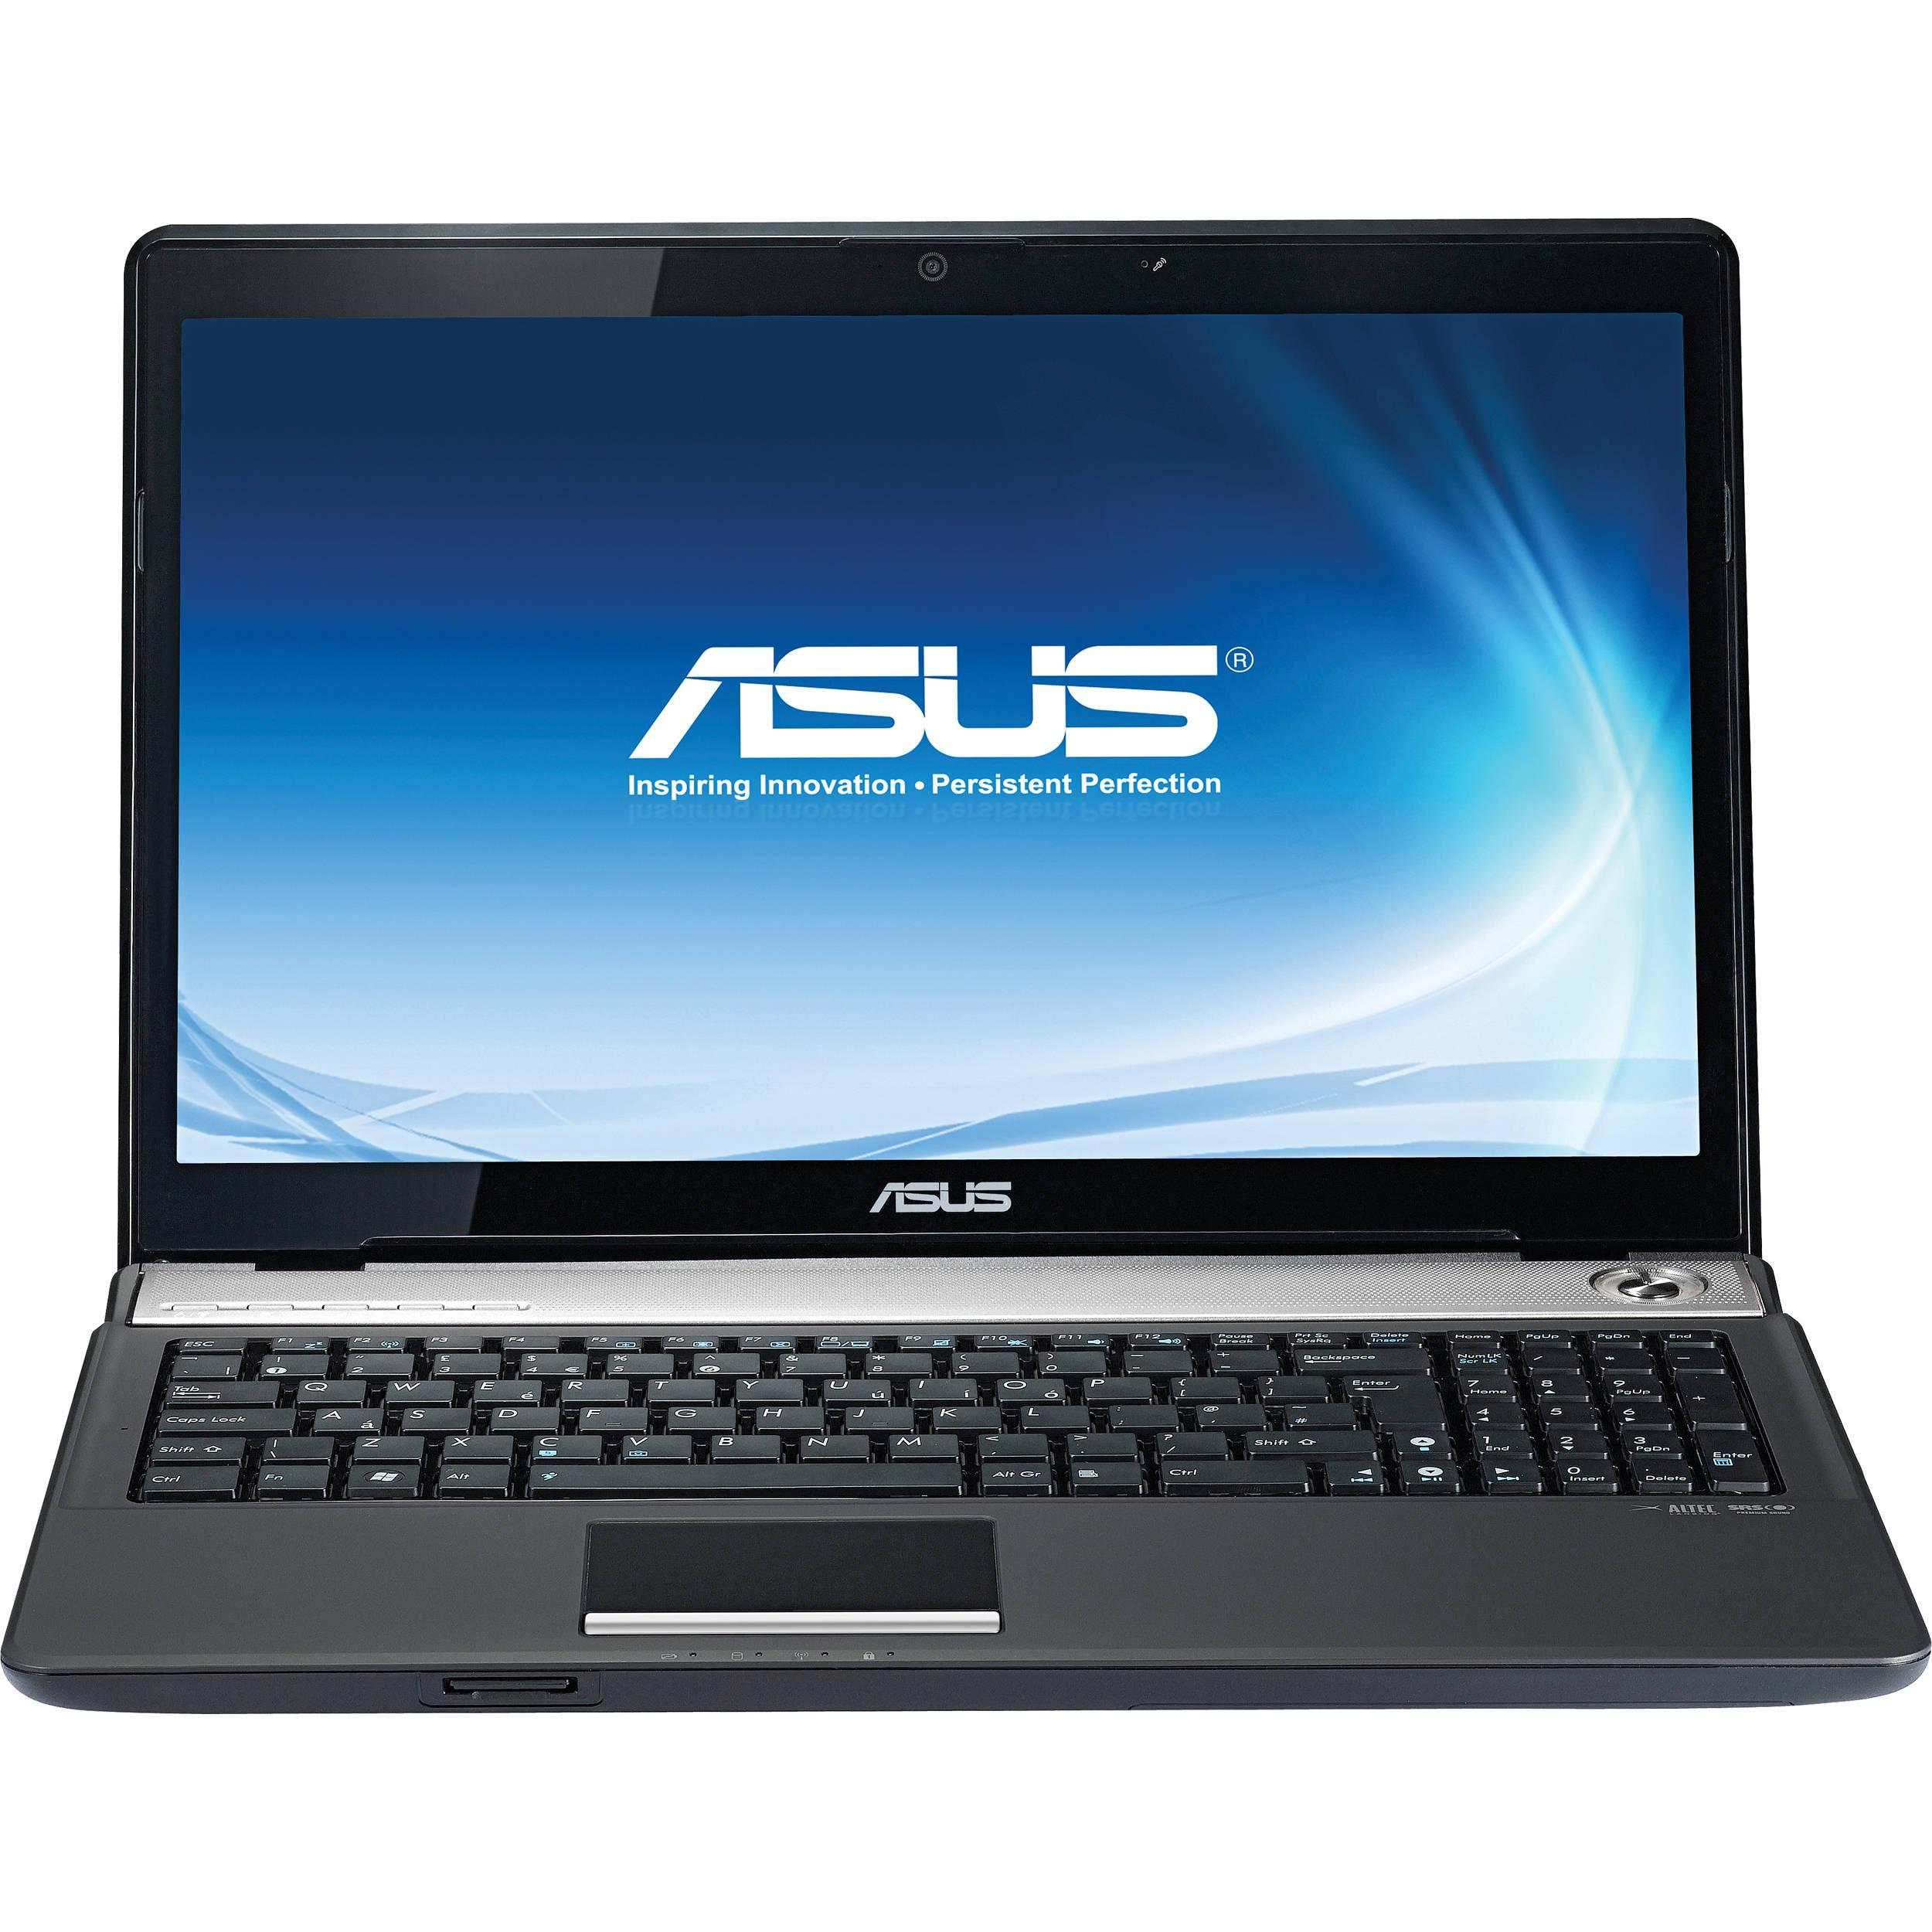 Asus N61Jq Notebook Intel Turbo Boost X64 Driver Download